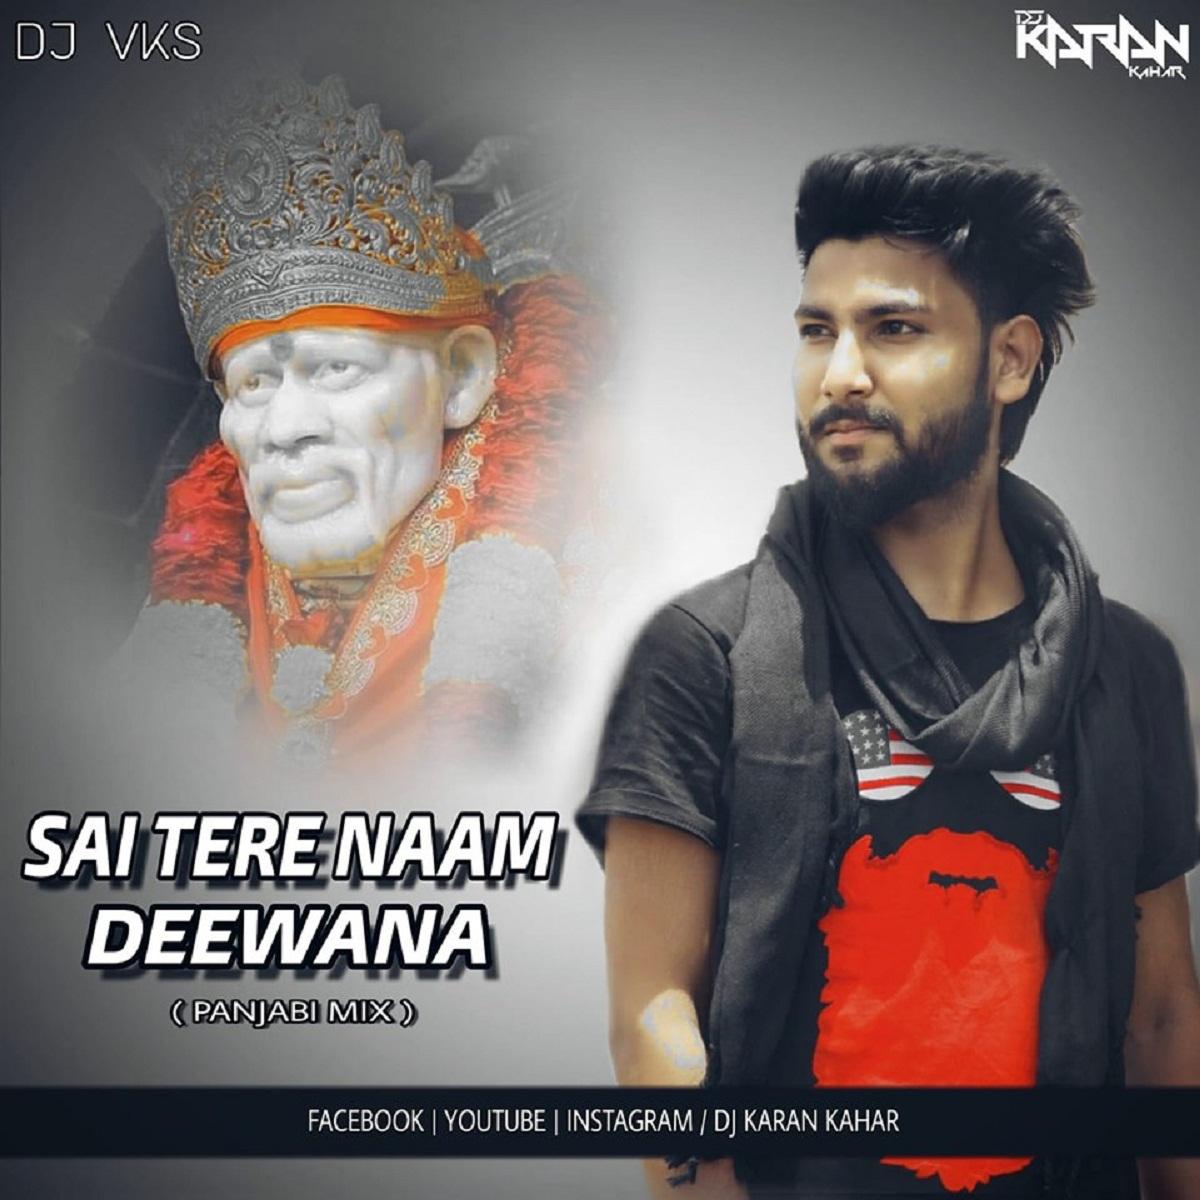 Sai Tere Naam Ke Deewane  Palki Special Remix  Dj Karan Kahar Dj VKS